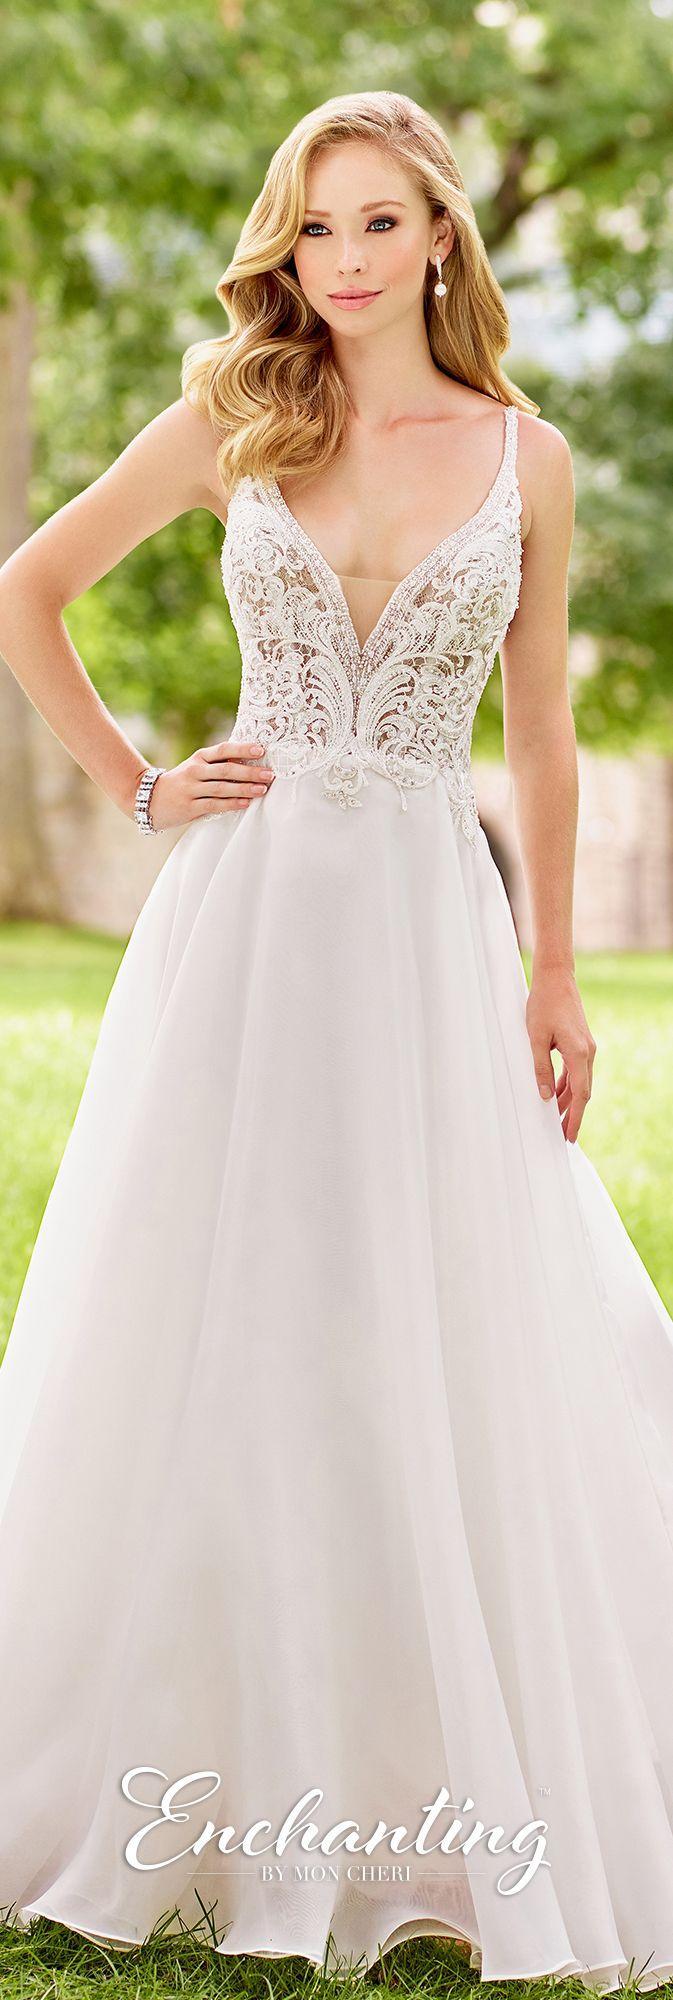 Hochzeit - Enchanting Wedding Dresses - 118137